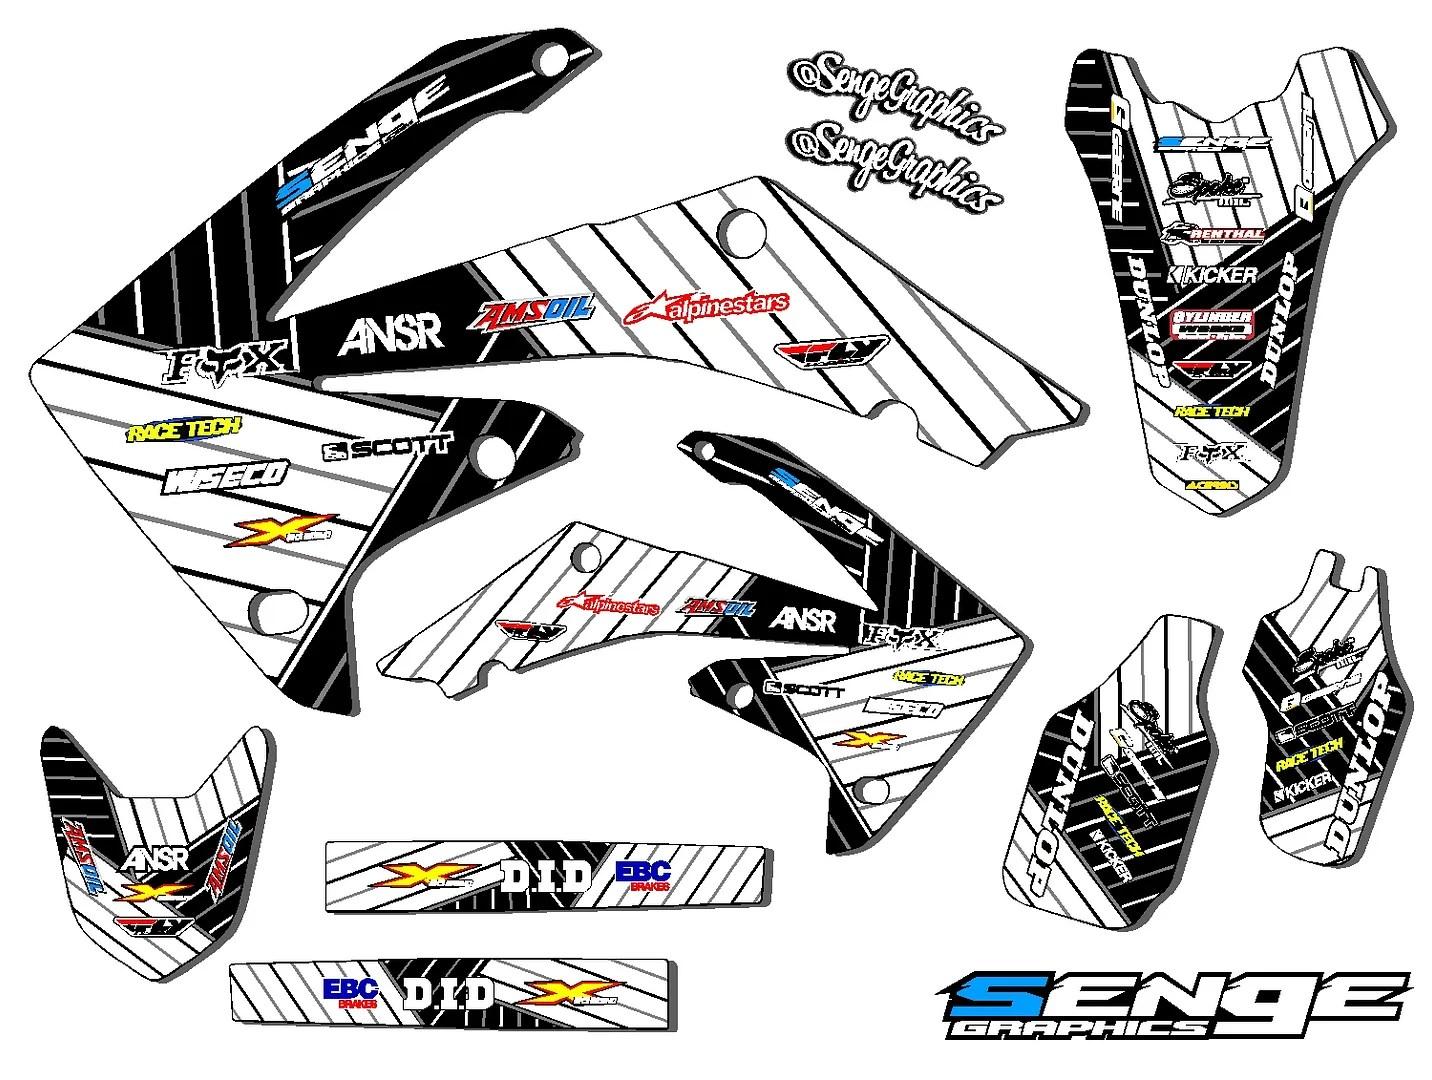 Xr 70 Graphics Kit Xr70 03 02 01 Deco